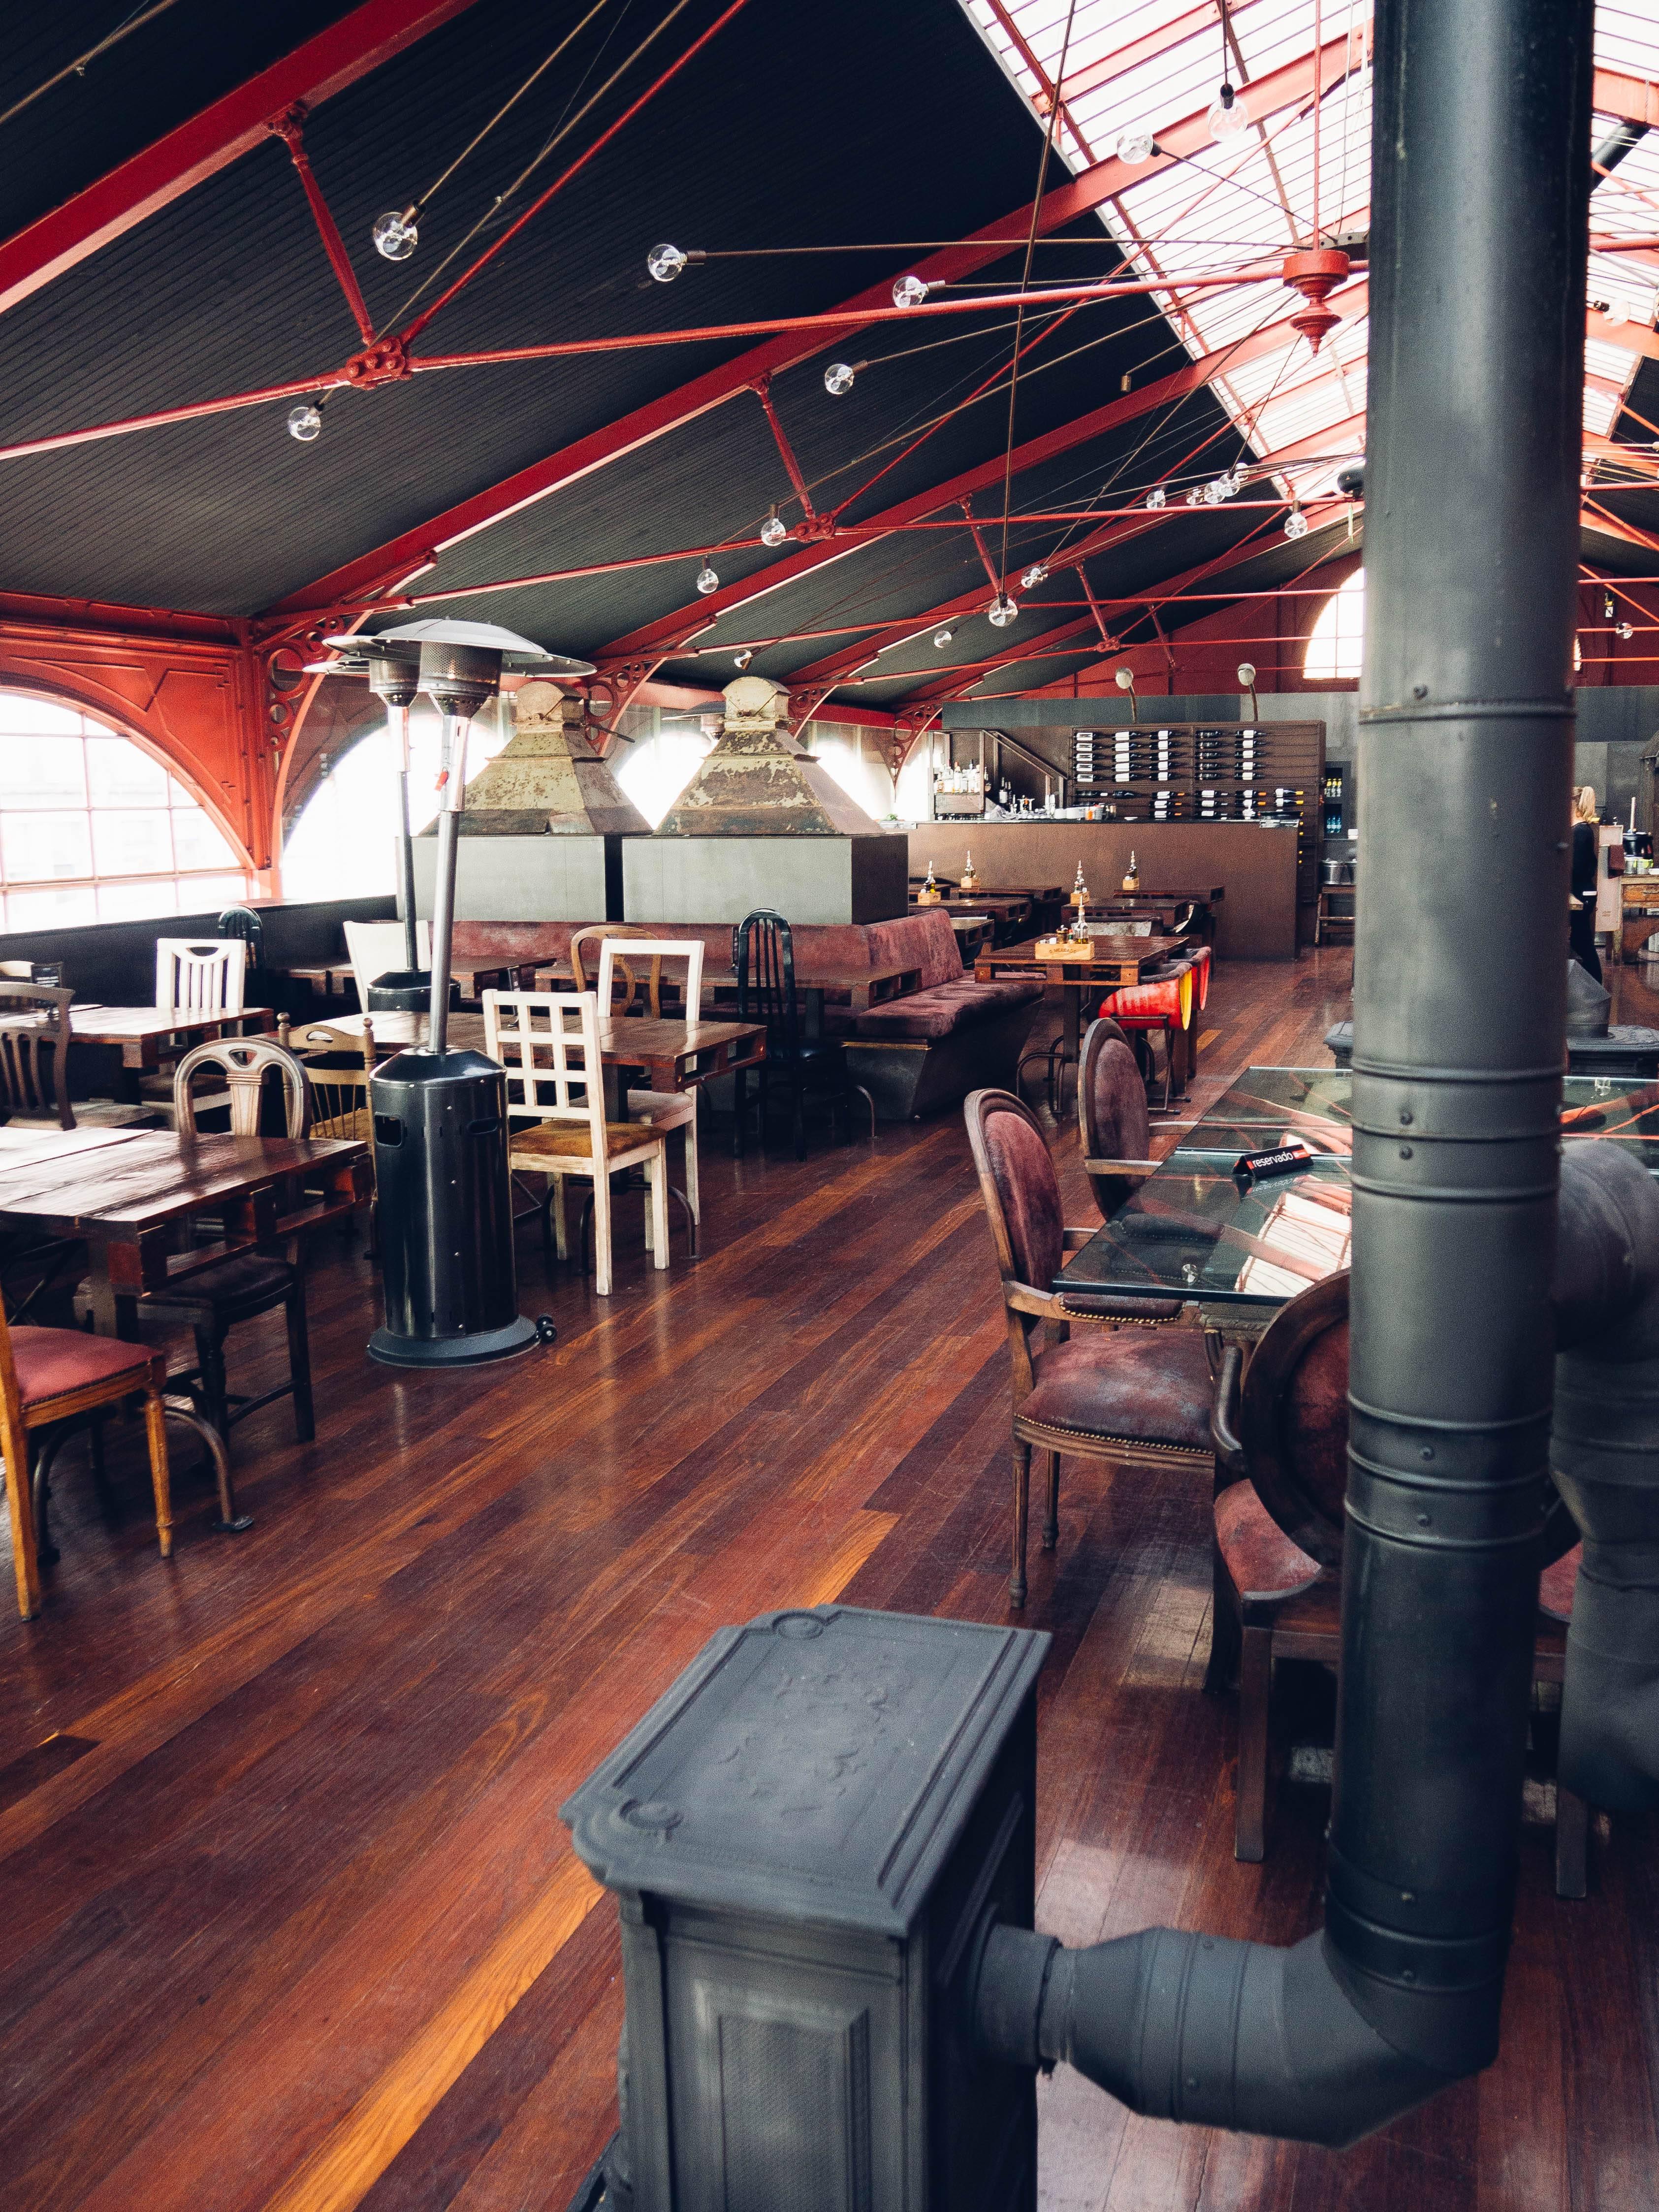 Photo 2: O Mercado, le restaurant industriel